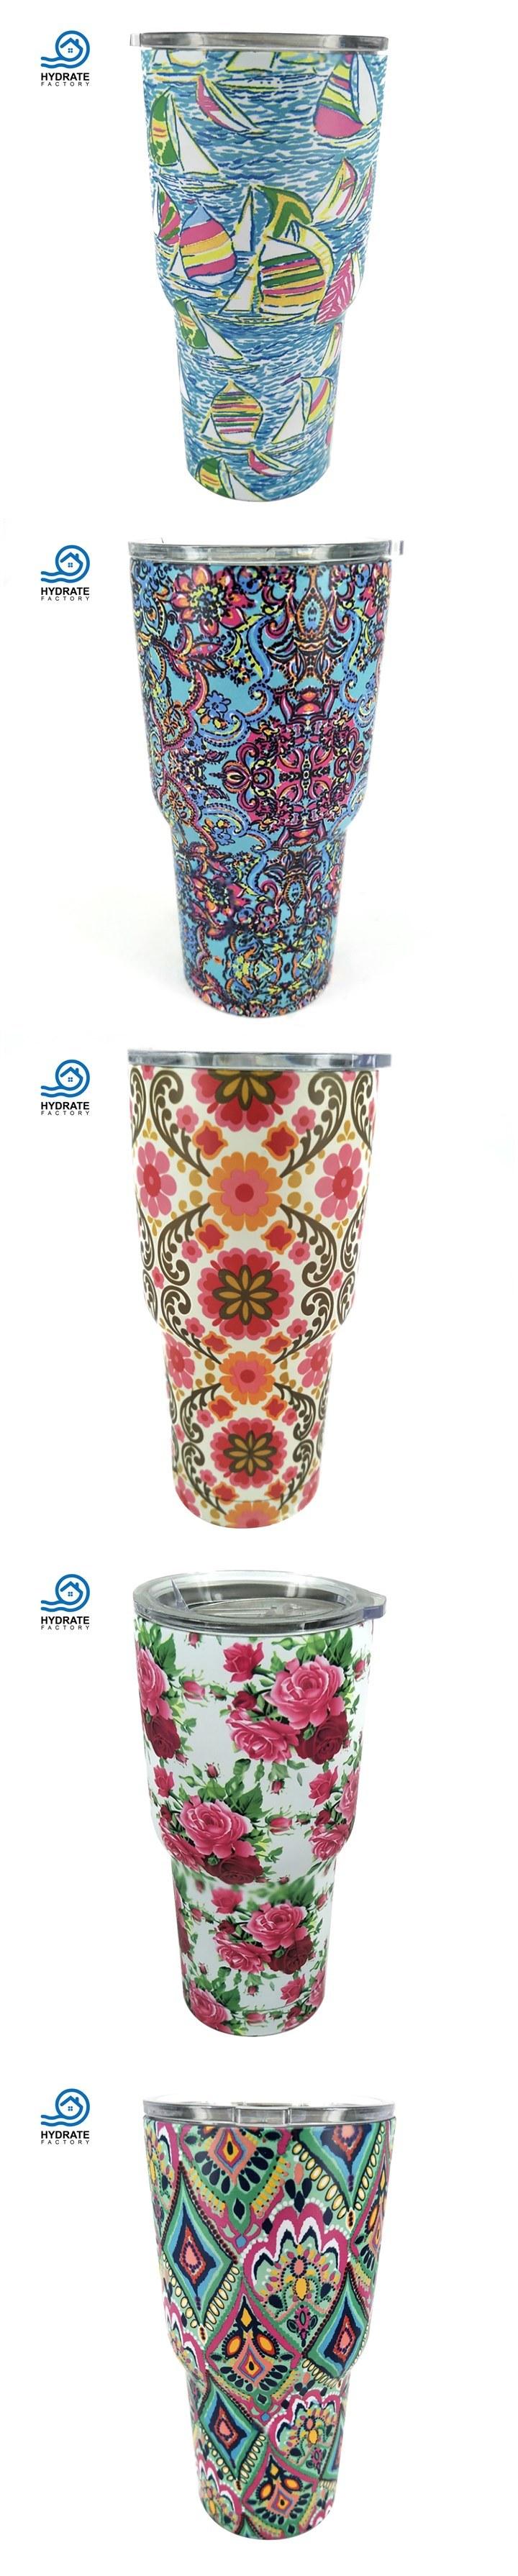 Maximum Insulation Stainless Steel Insulation Flask Coffee Mug